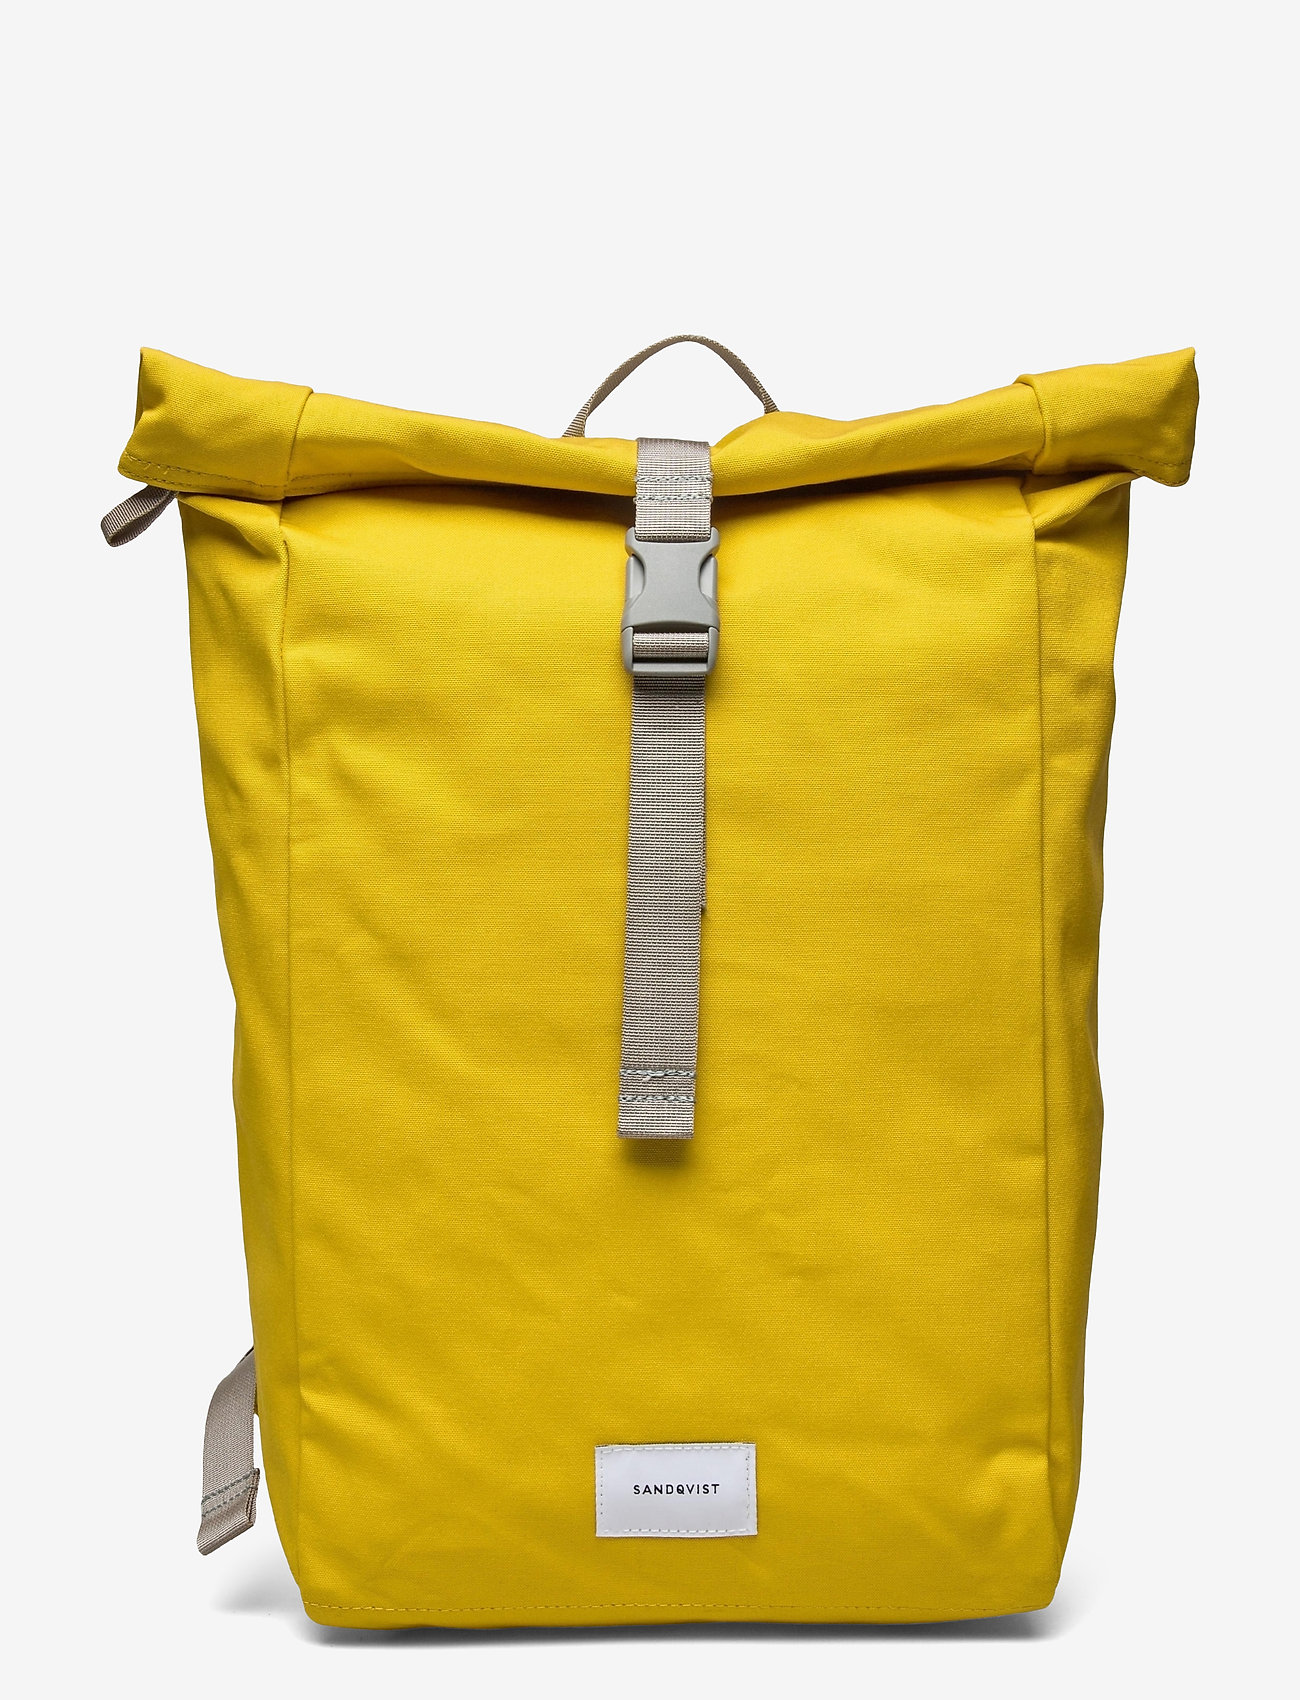 SANDQVIST - KAJ - bags - yellow with grey webbing - 0